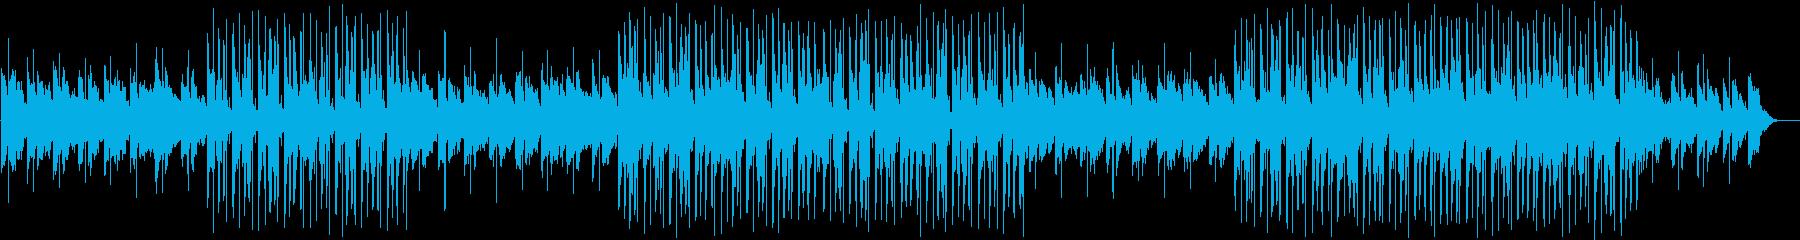 kawaii R&B・lofiチルアウトの再生済みの波形